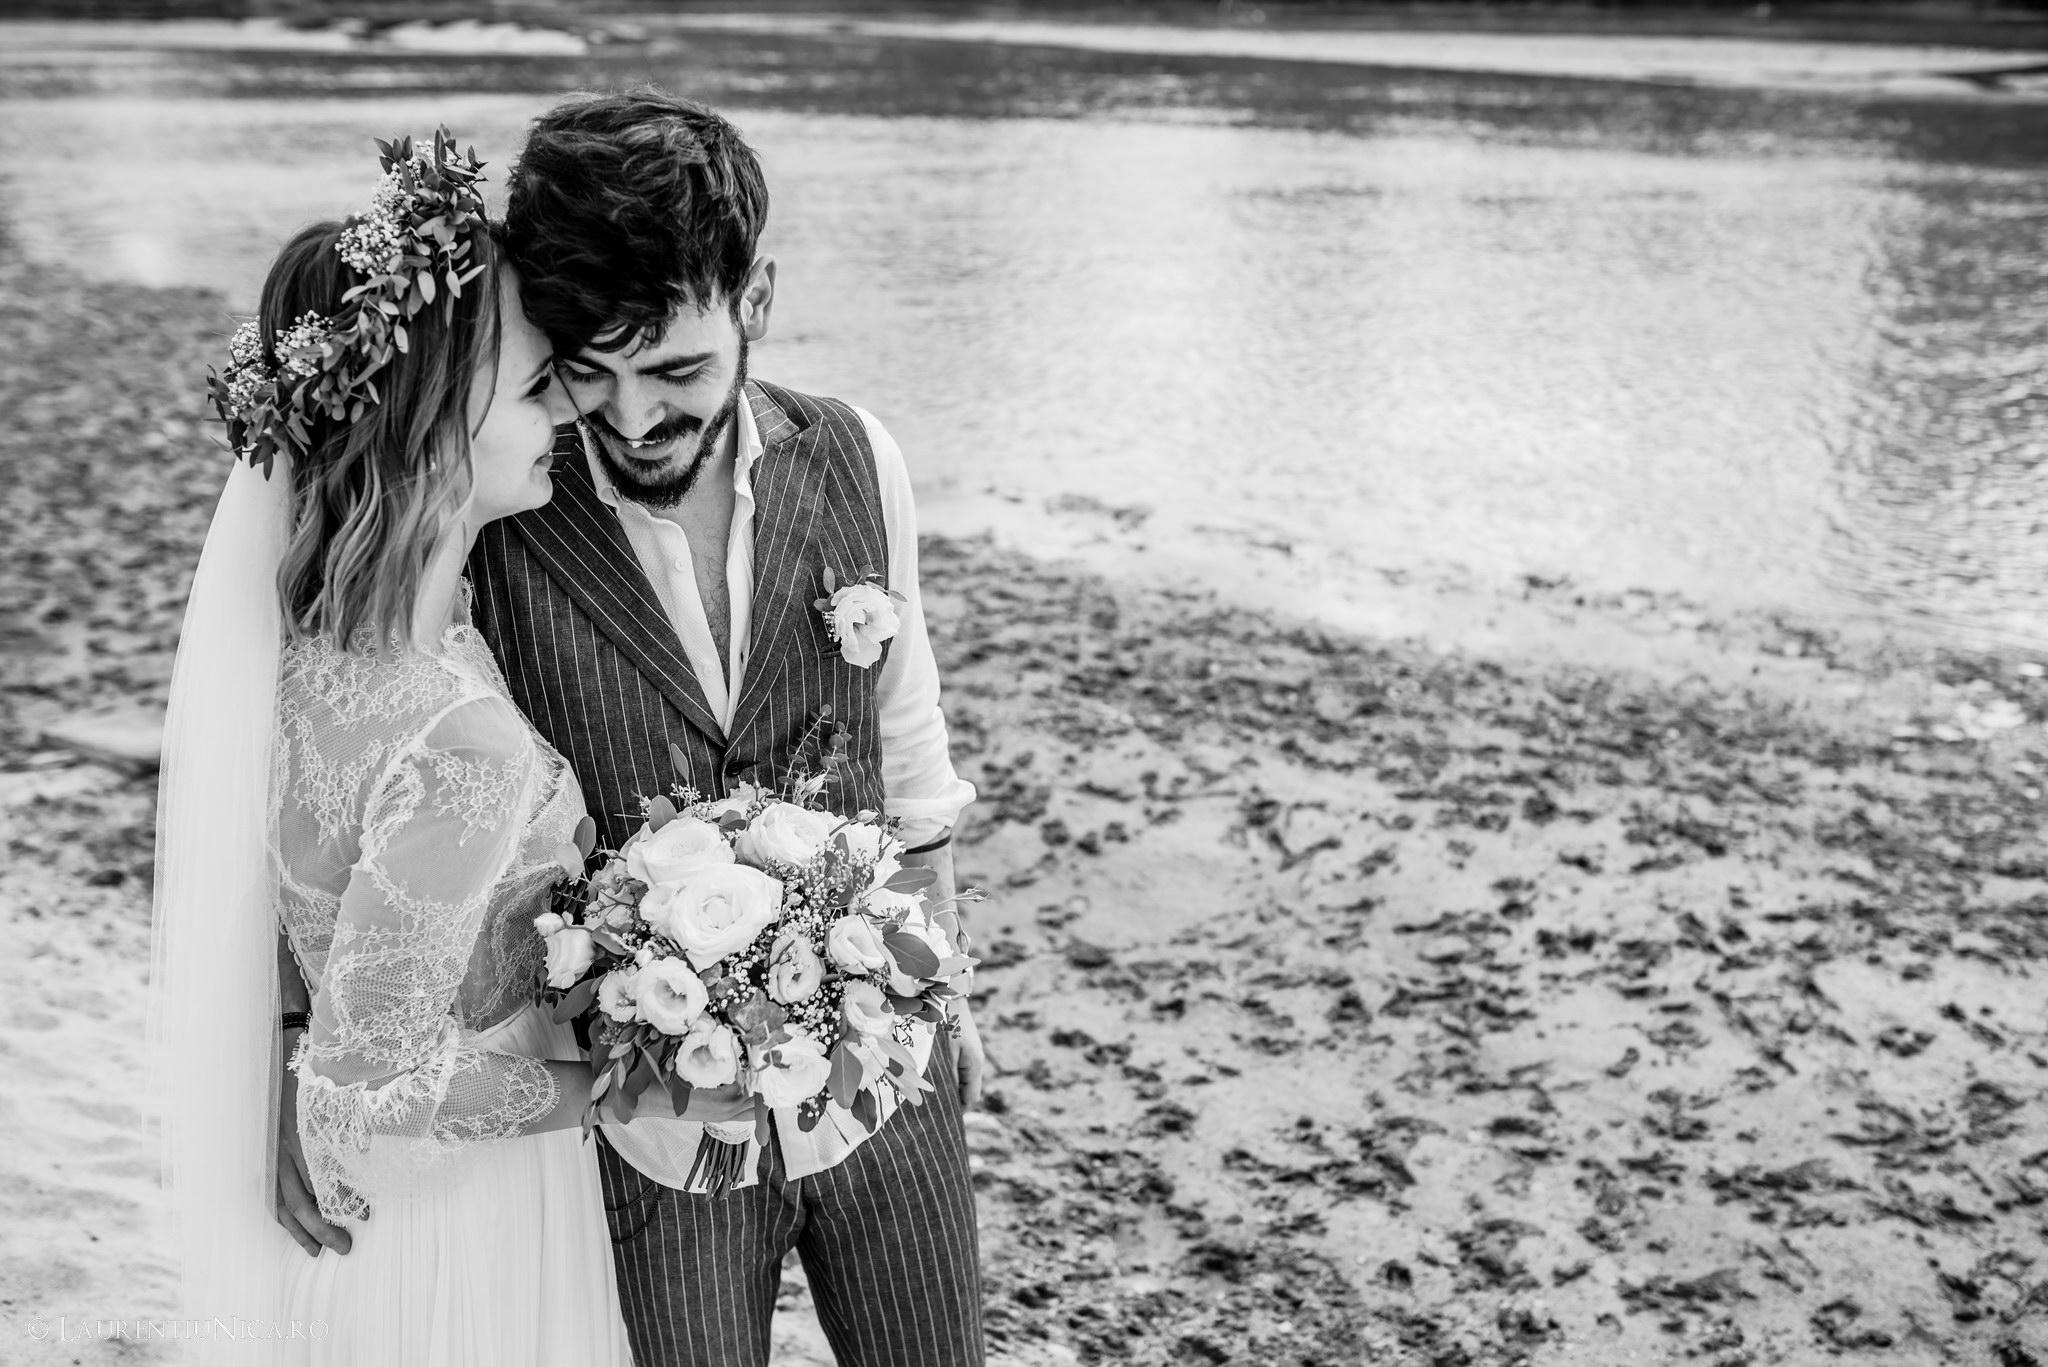 20180915 LN 0620 - Diana & Marius | Fotografii nunta | Slatina